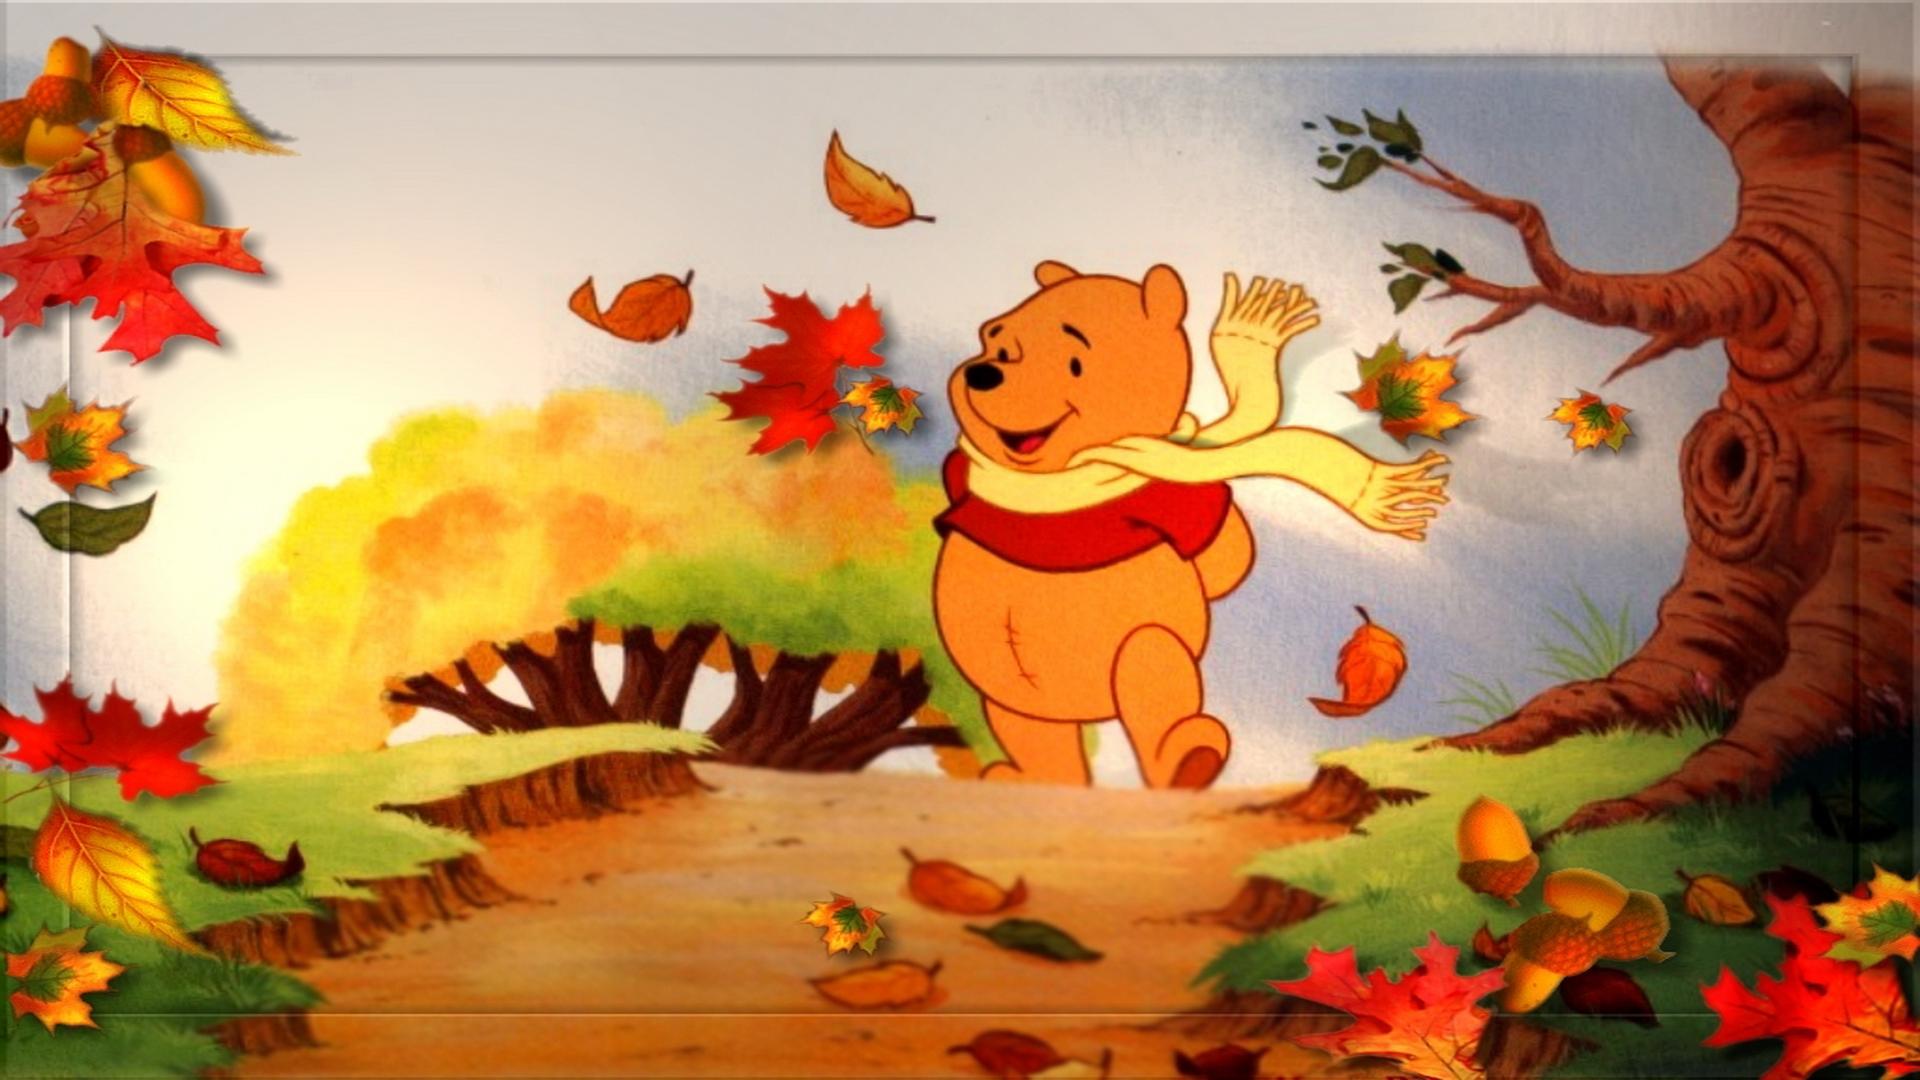 Disney Thanksgiving Wallpaper and - 971.2KB